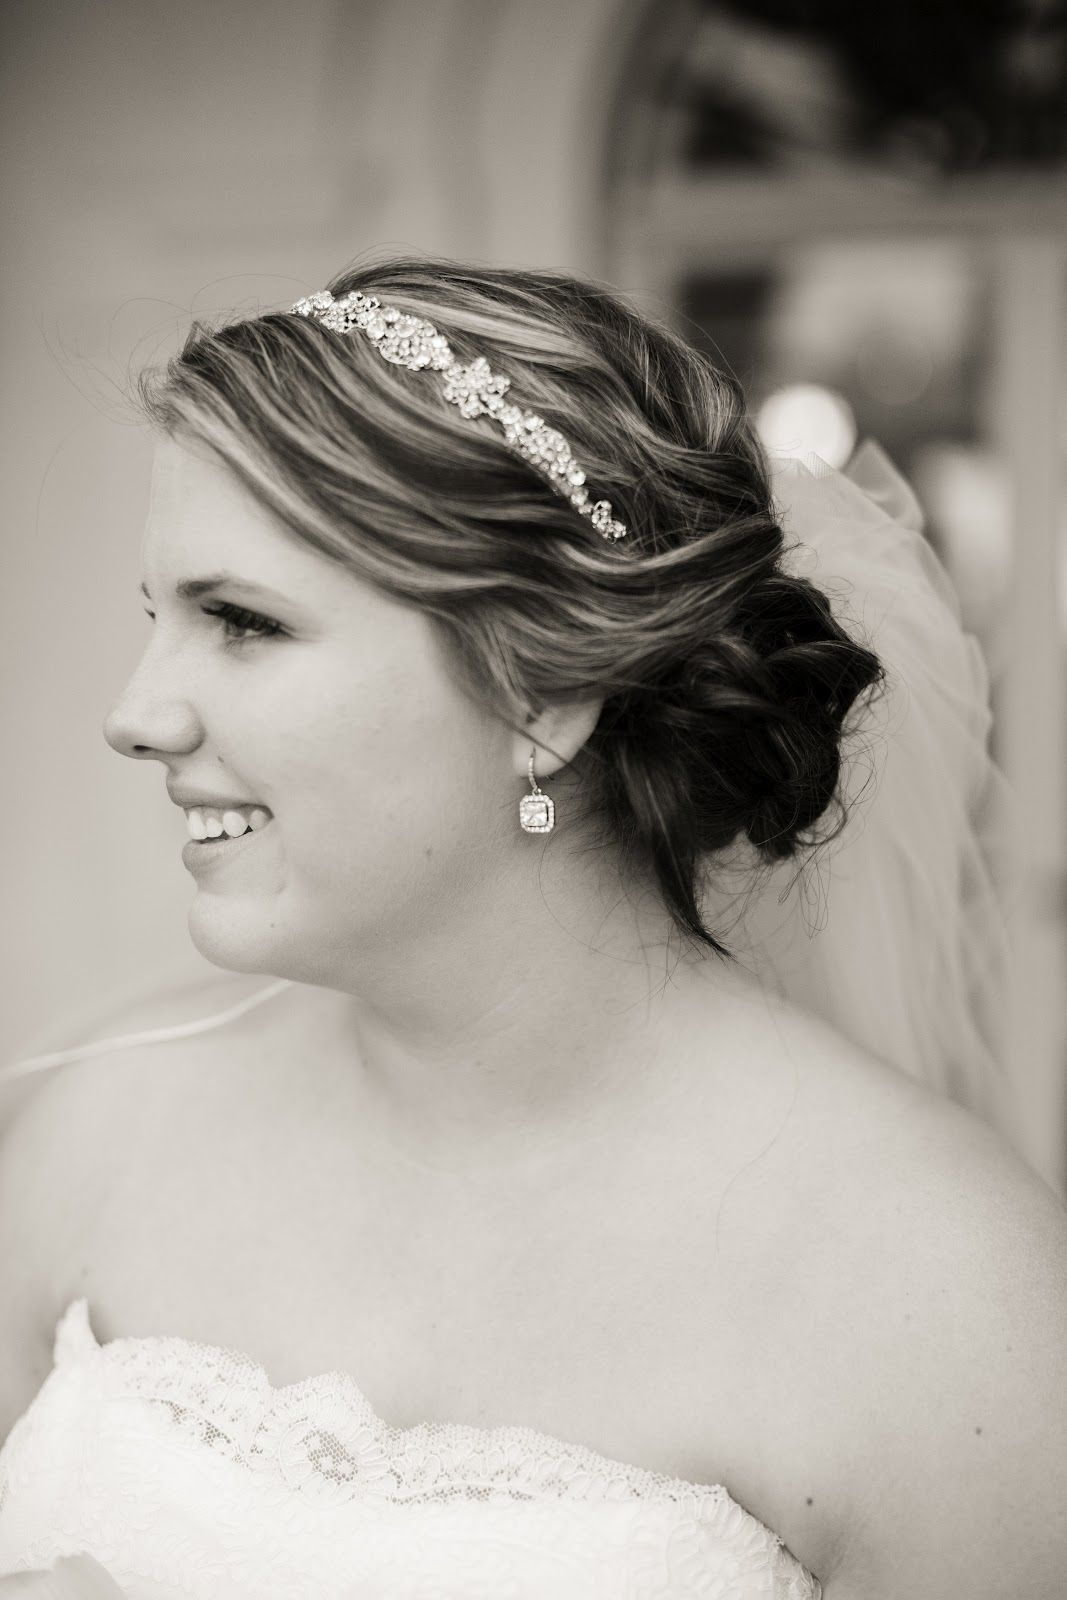 wedding hair - headband + veil + simple updo to the side